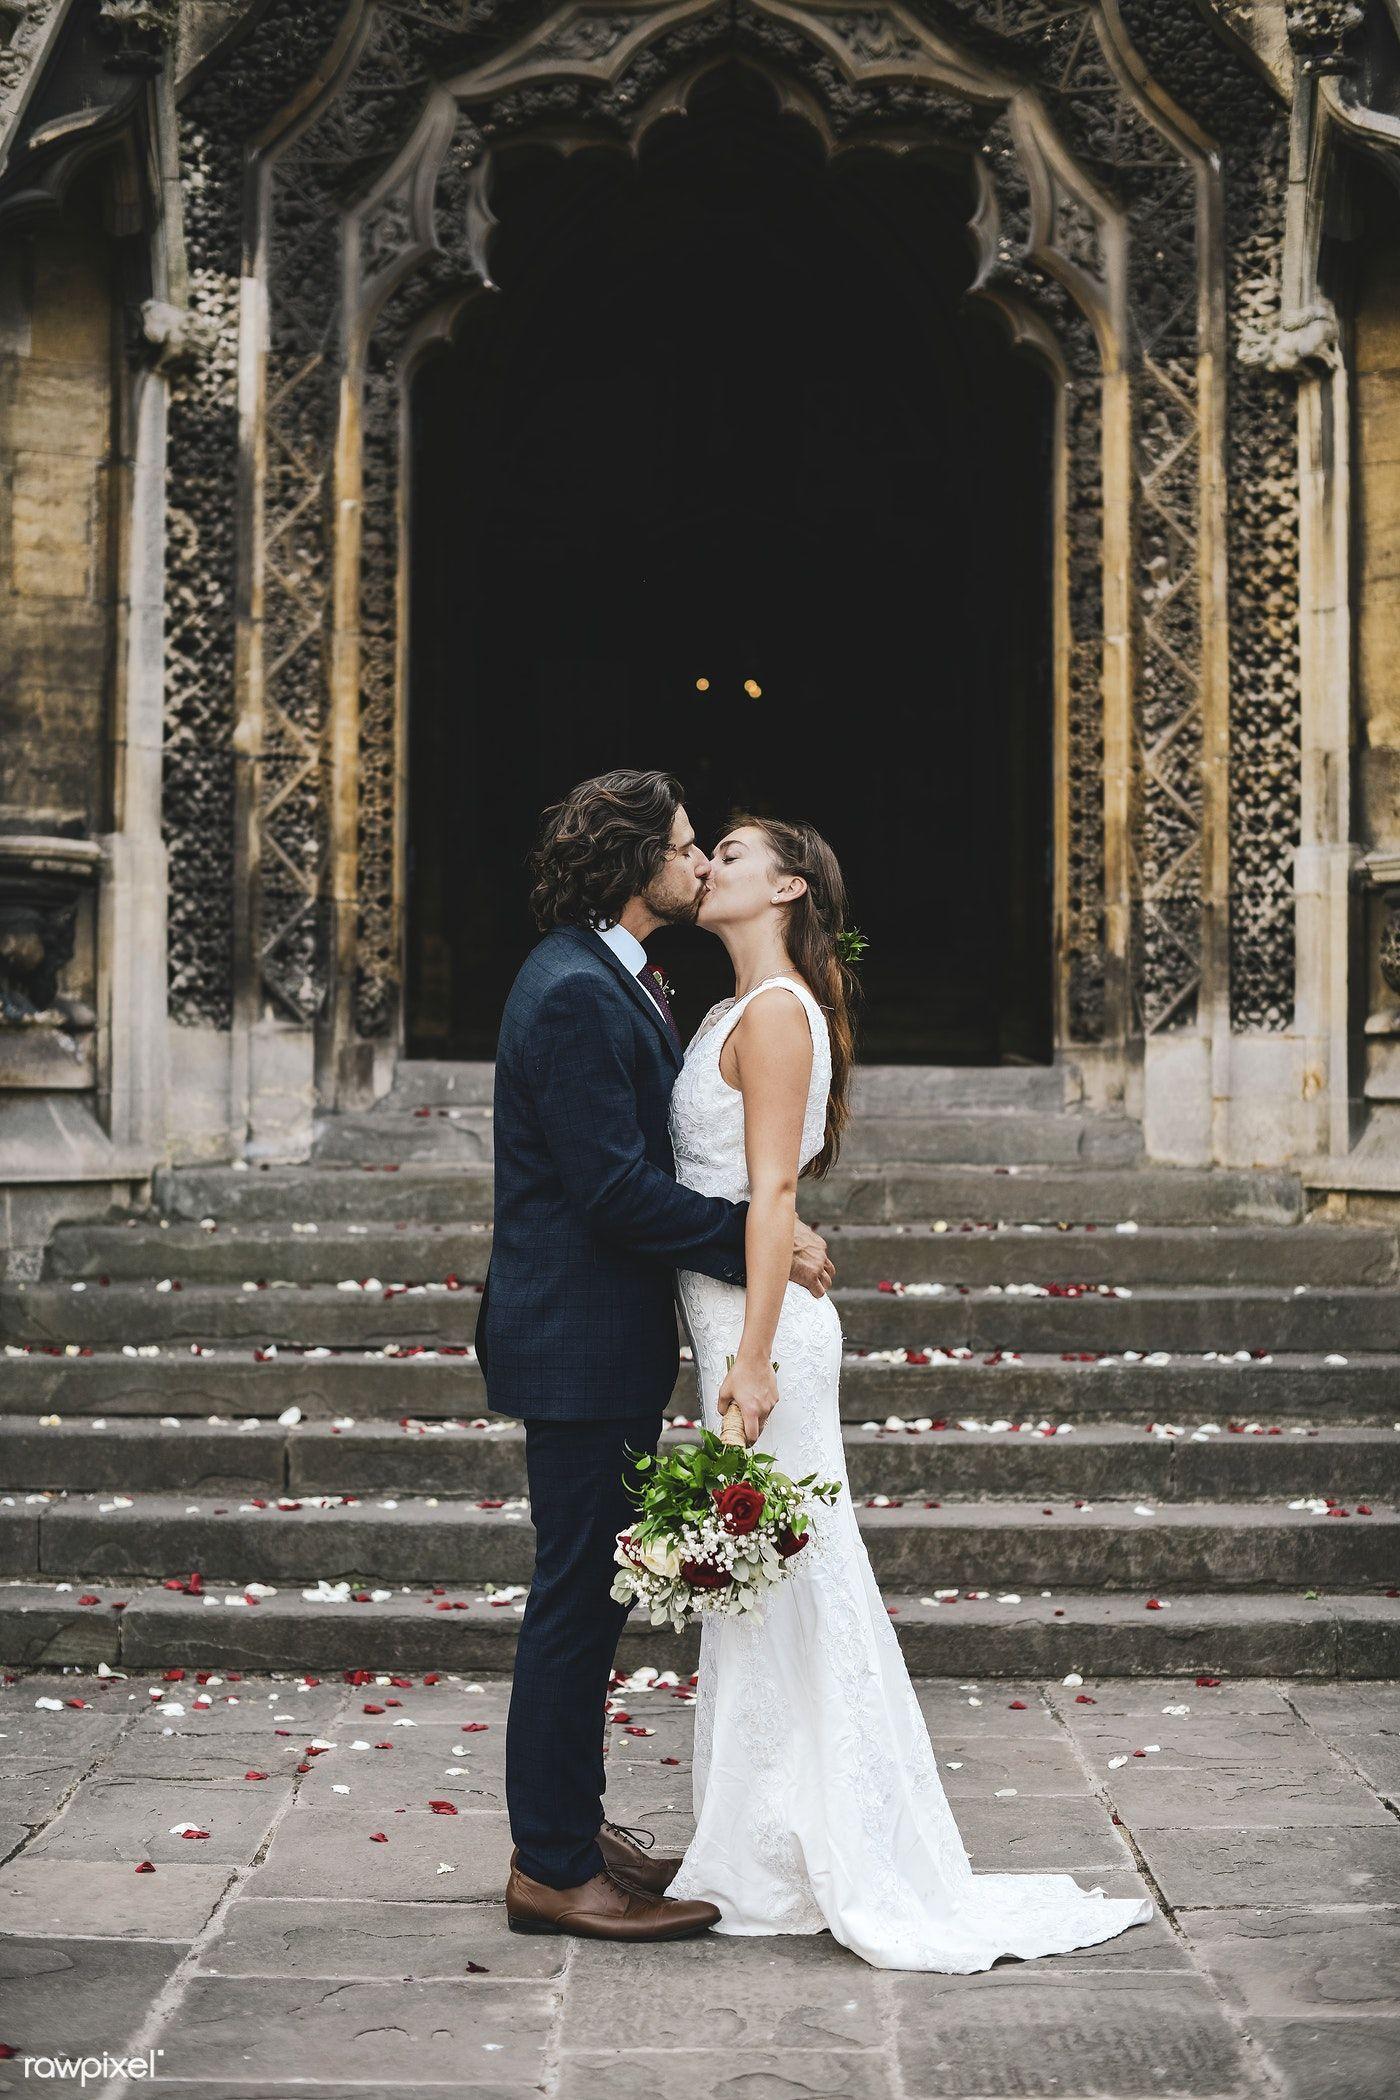 Happy Newly Wed Couple At The Church Premium Image By Rawpixel Com Chanikarn Thongsupa